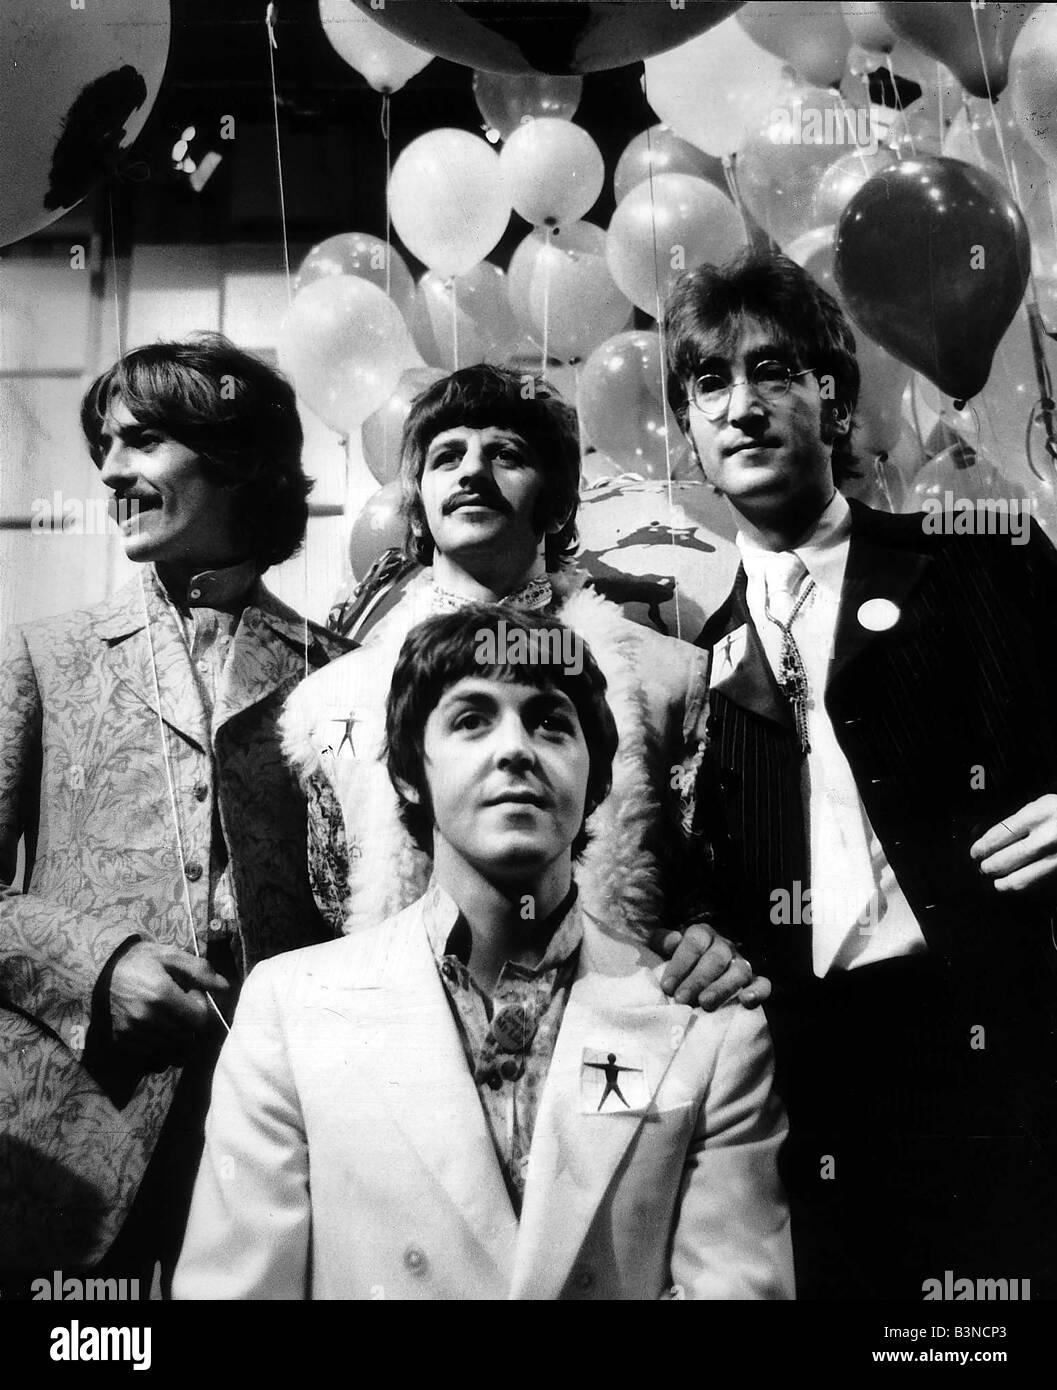 The Beatles Pop Group June 1967 Paul McCartney George Harrison John Lennon And Ringo Starr At EMI Stidios